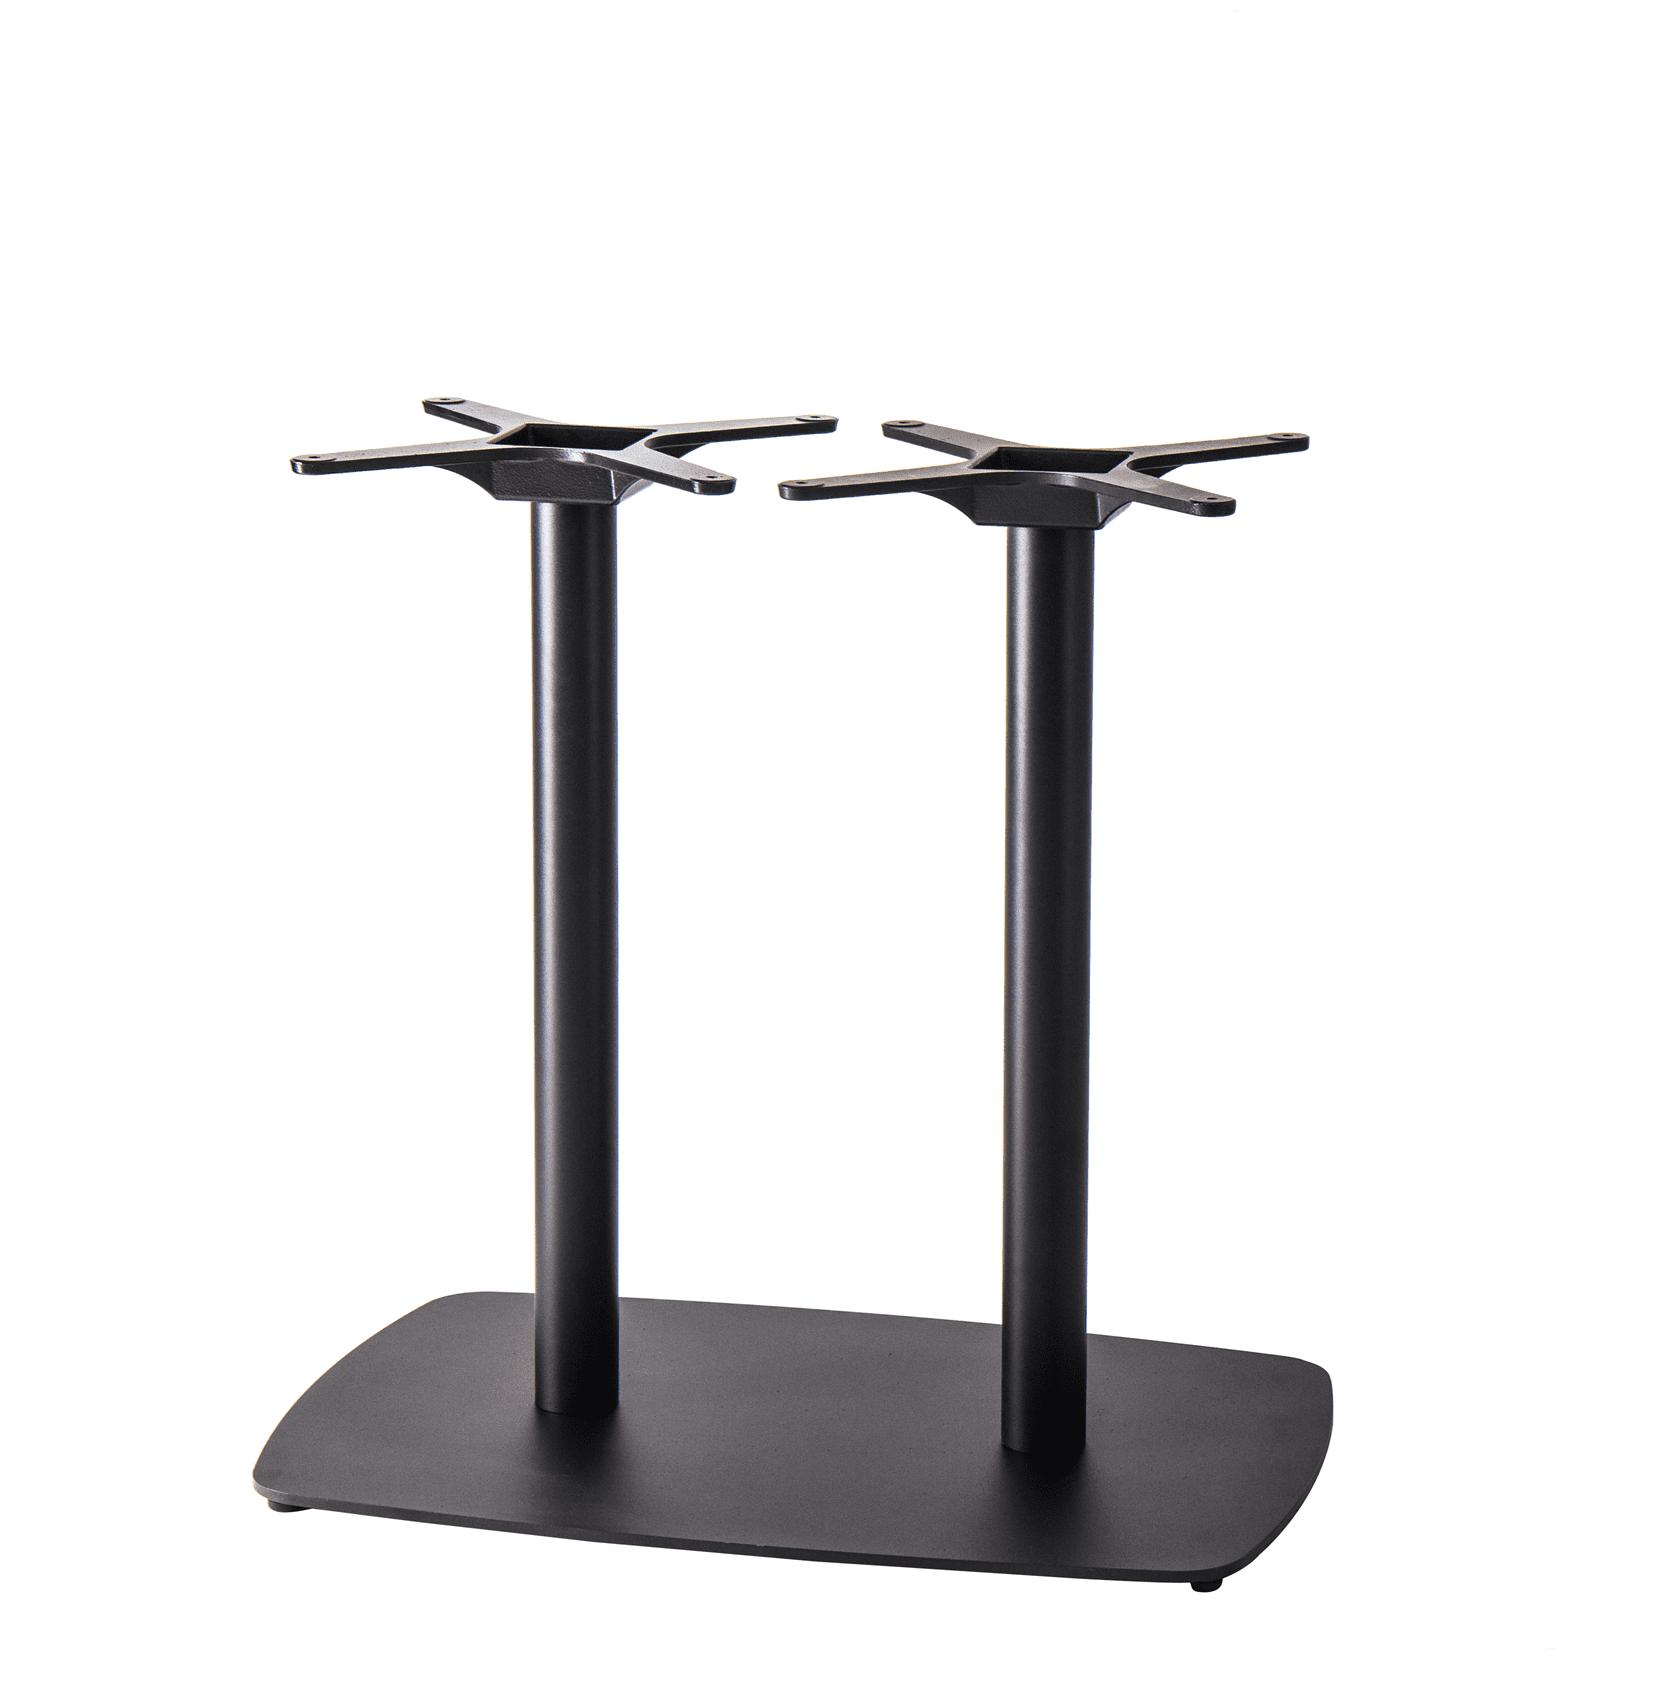 Tarot twin table base black dining height